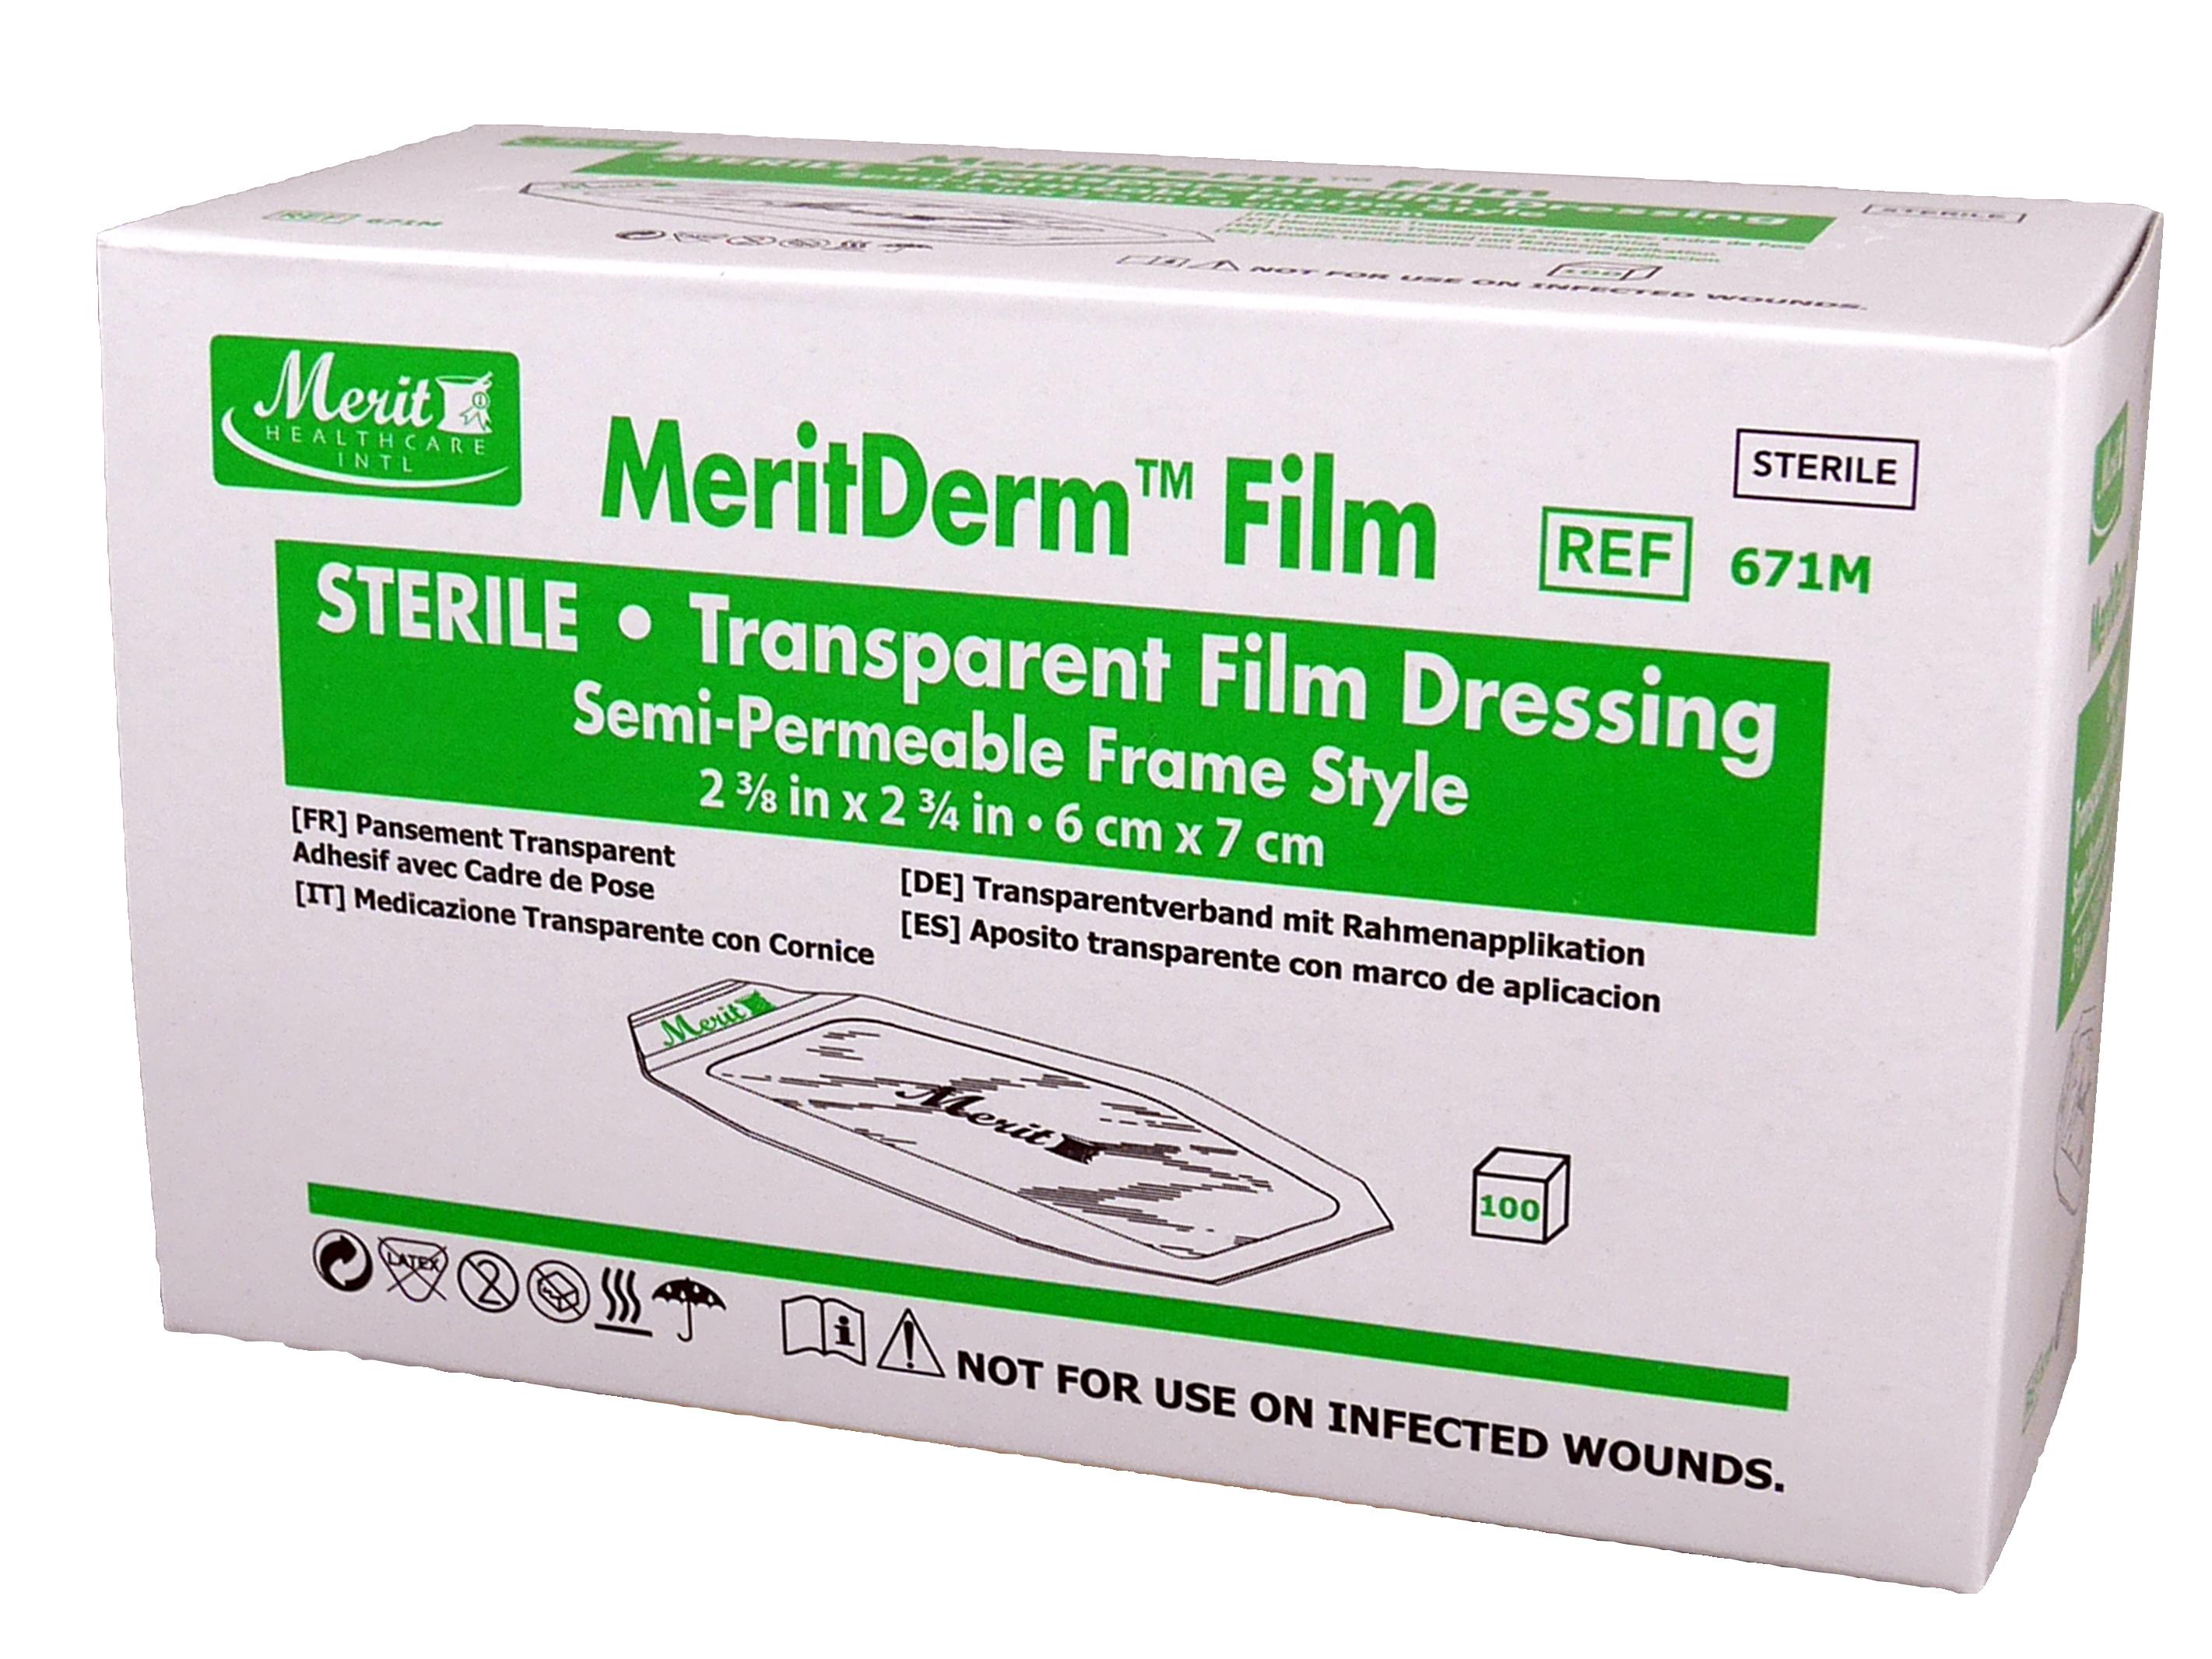 Transparent Film Dressing 2-3/8 X 2-3/4 Inch Frame Style MeriDerm™